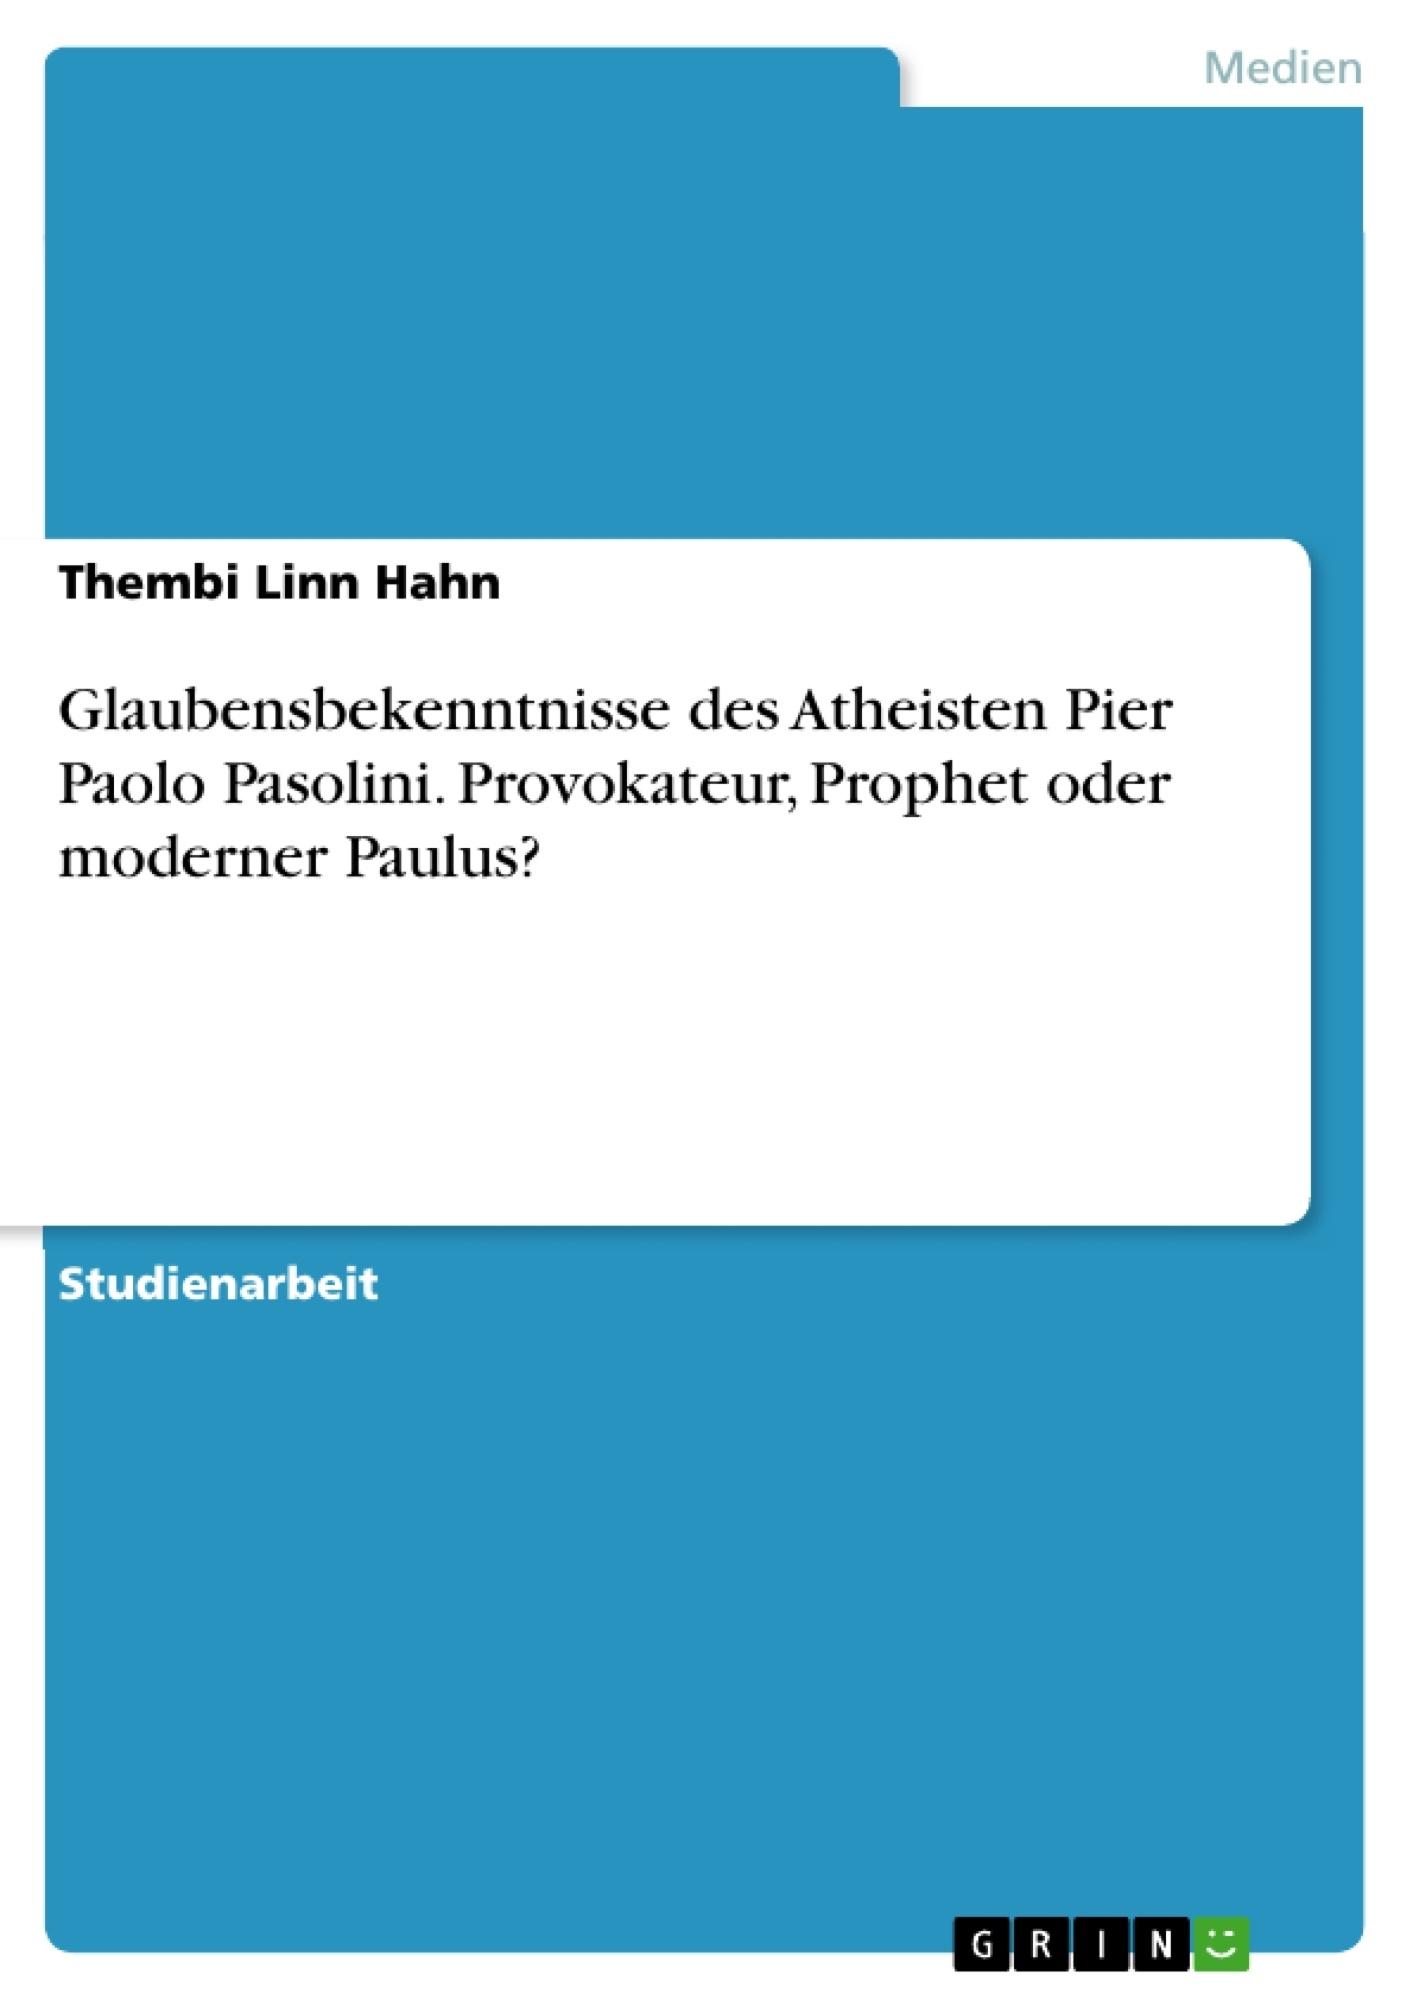 Titel: Glaubensbekenntnisse des Atheisten Pier Paolo Pasolini. Provokateur, Prophet oder moderner Paulus?